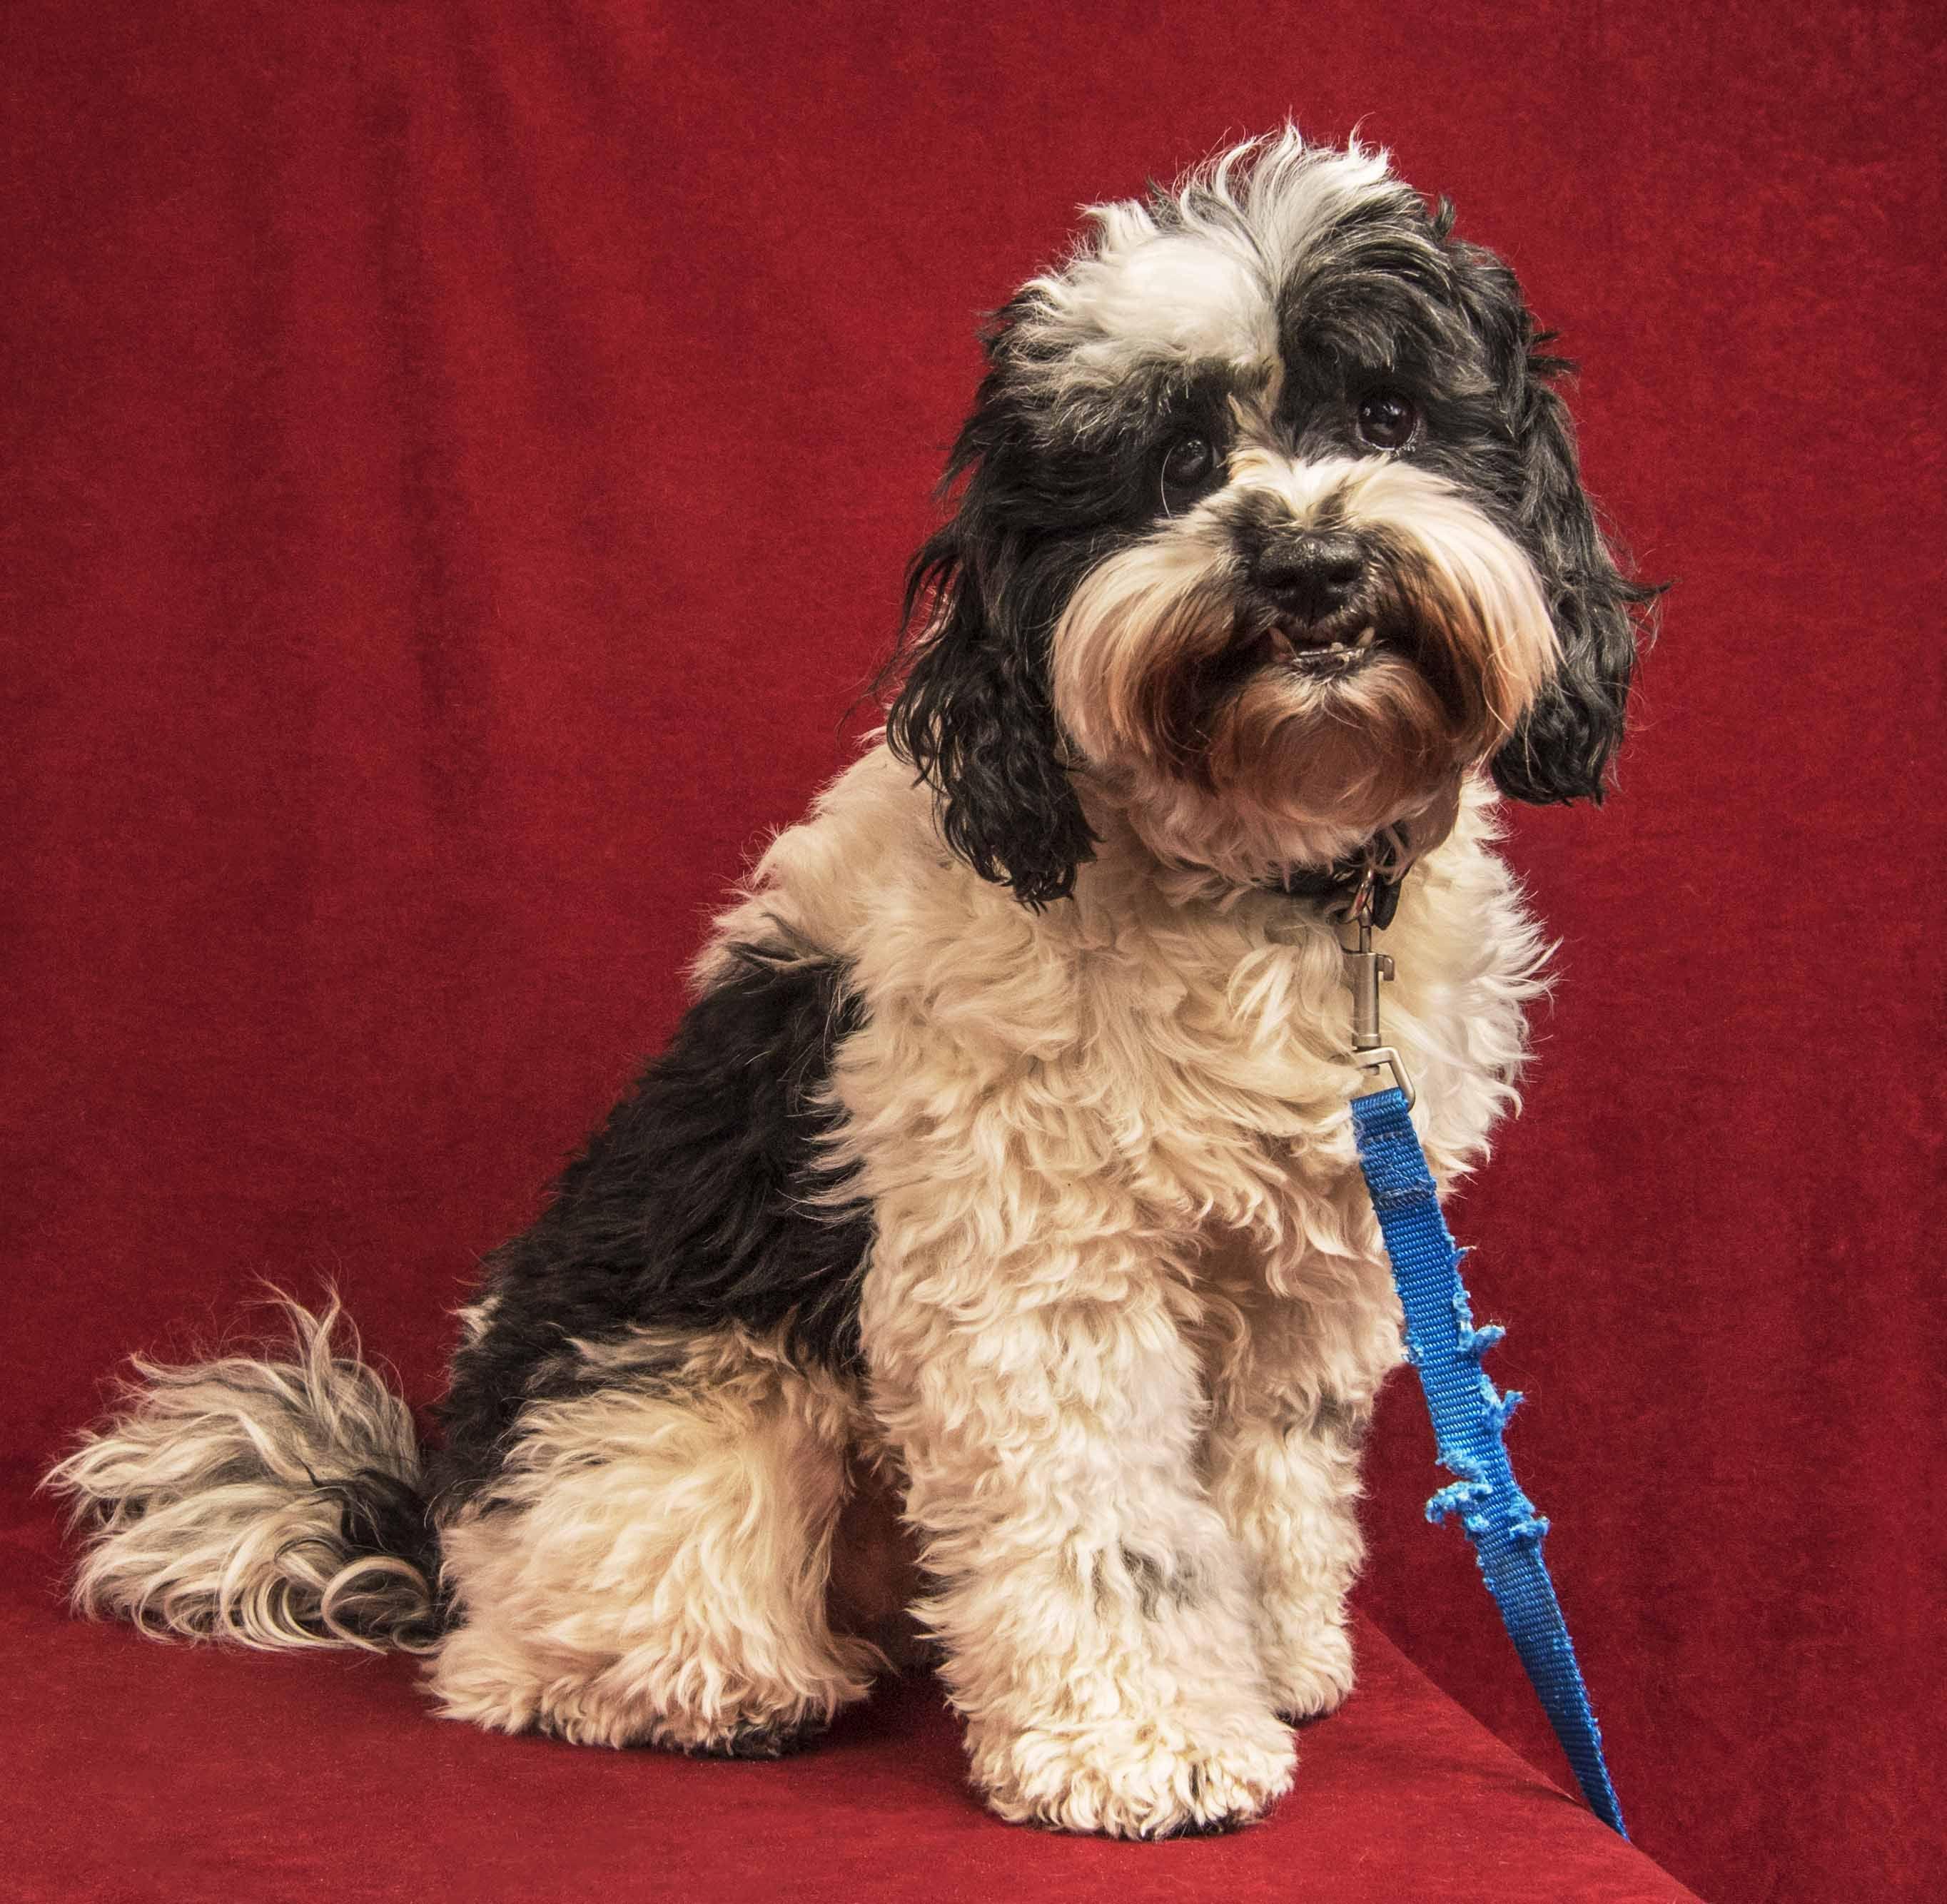 Shih Tzu dog for Adoption in Davis, CA. ADN599082 on